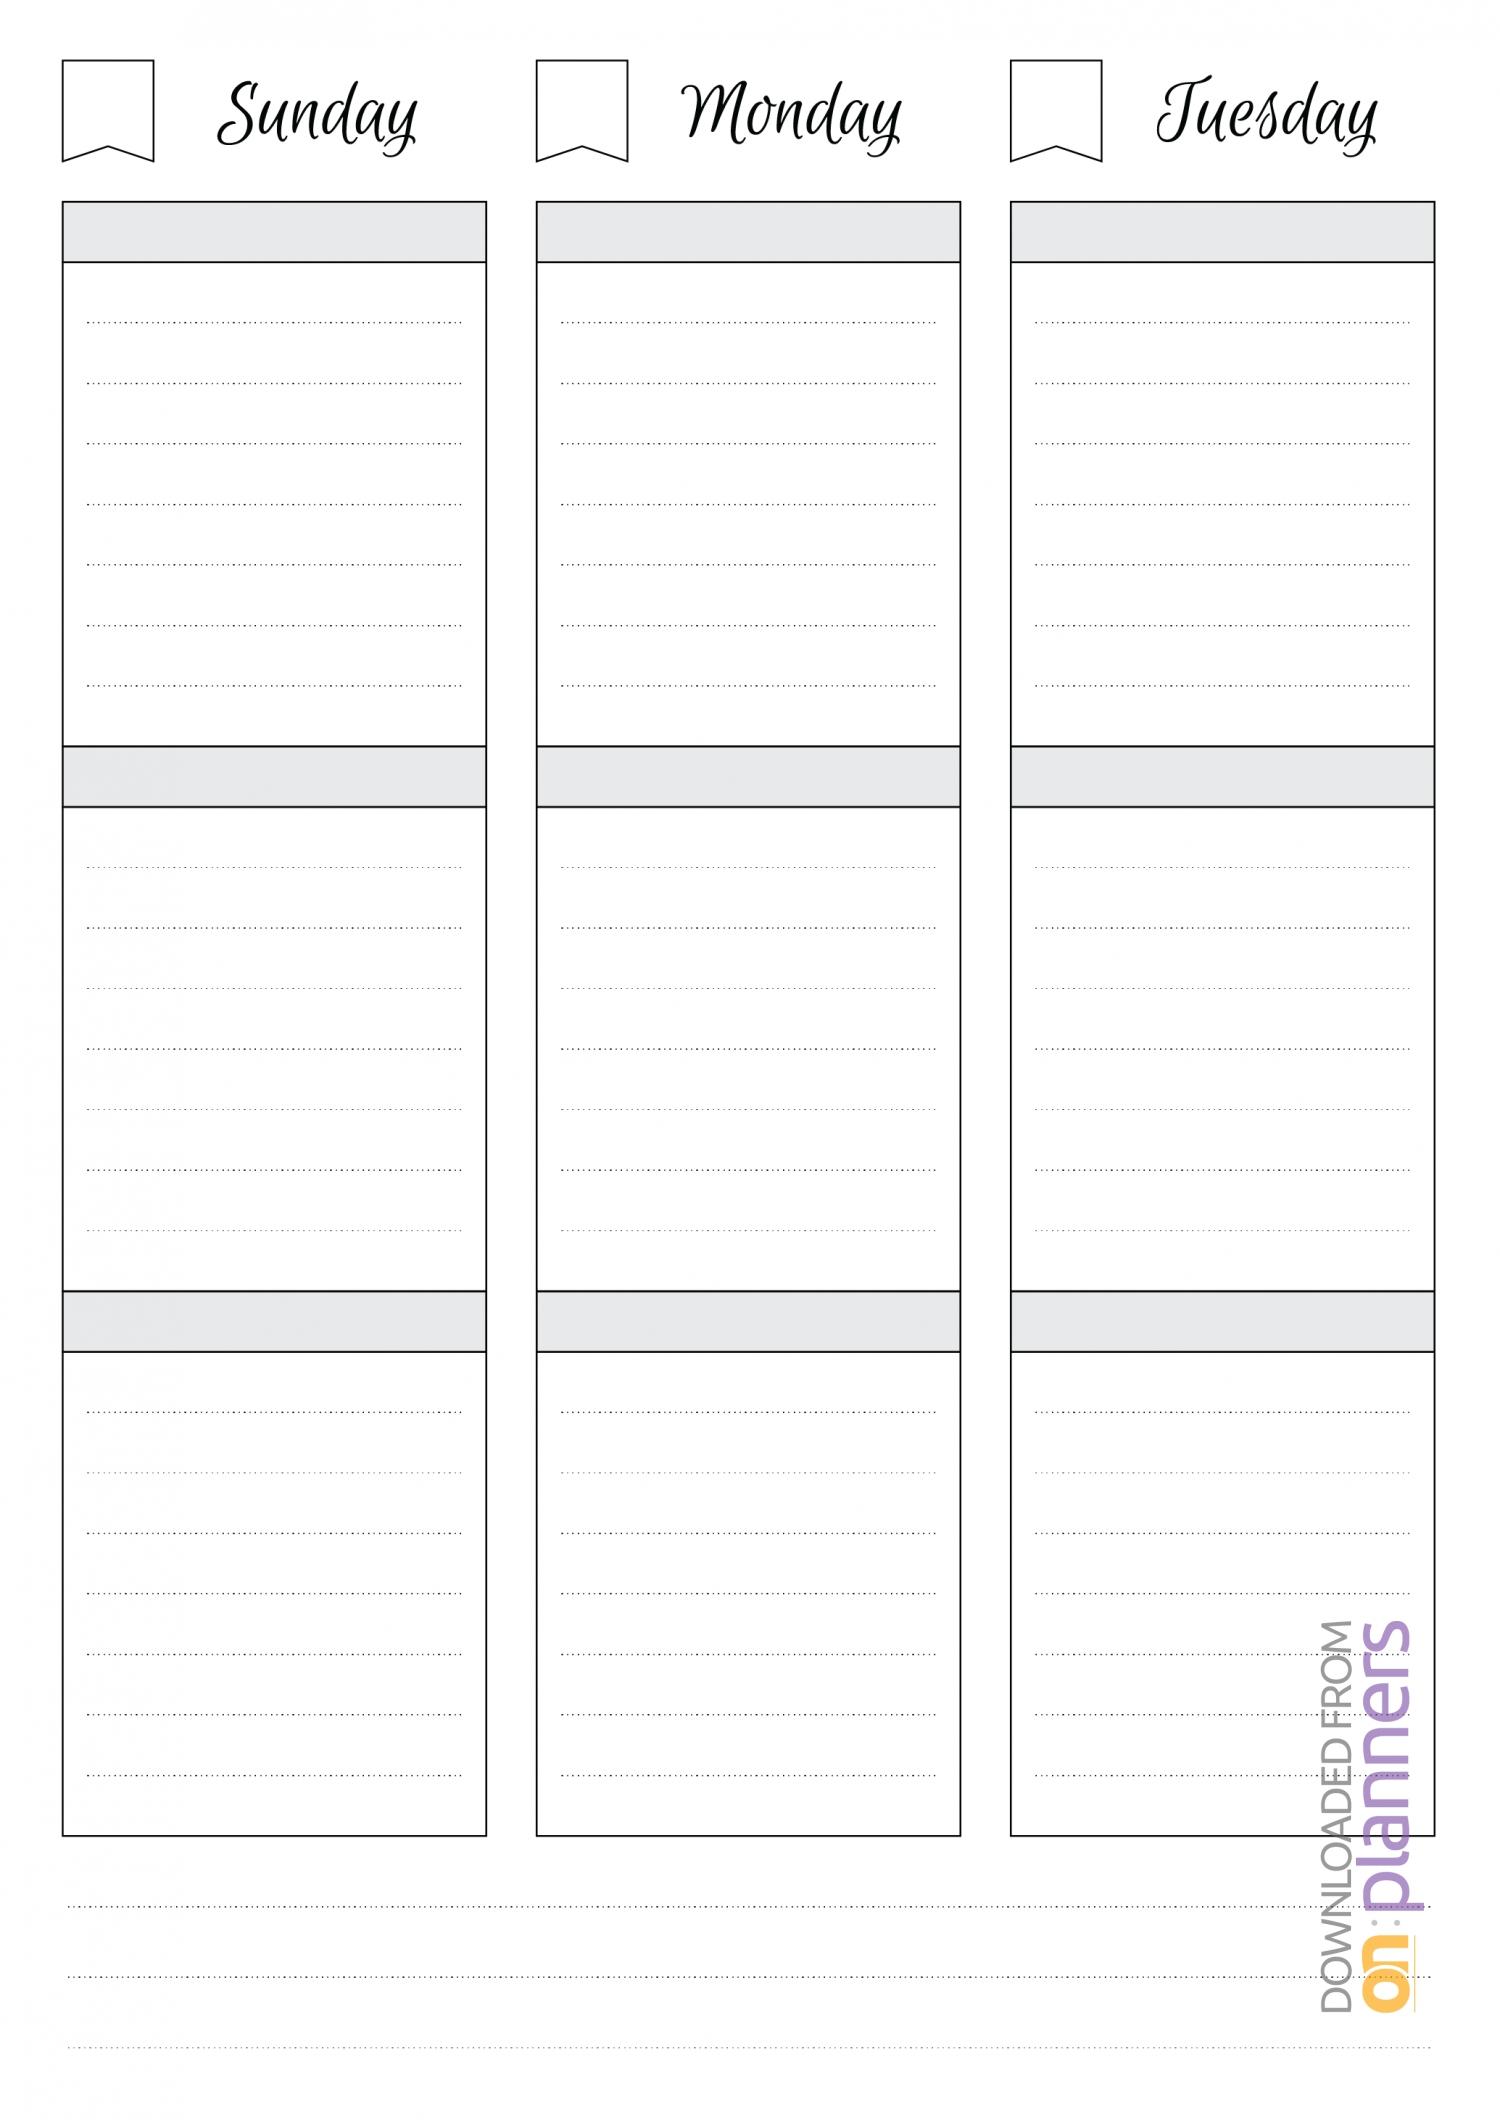 Printable Blank Weekly Calendars Templates | Free Calendar